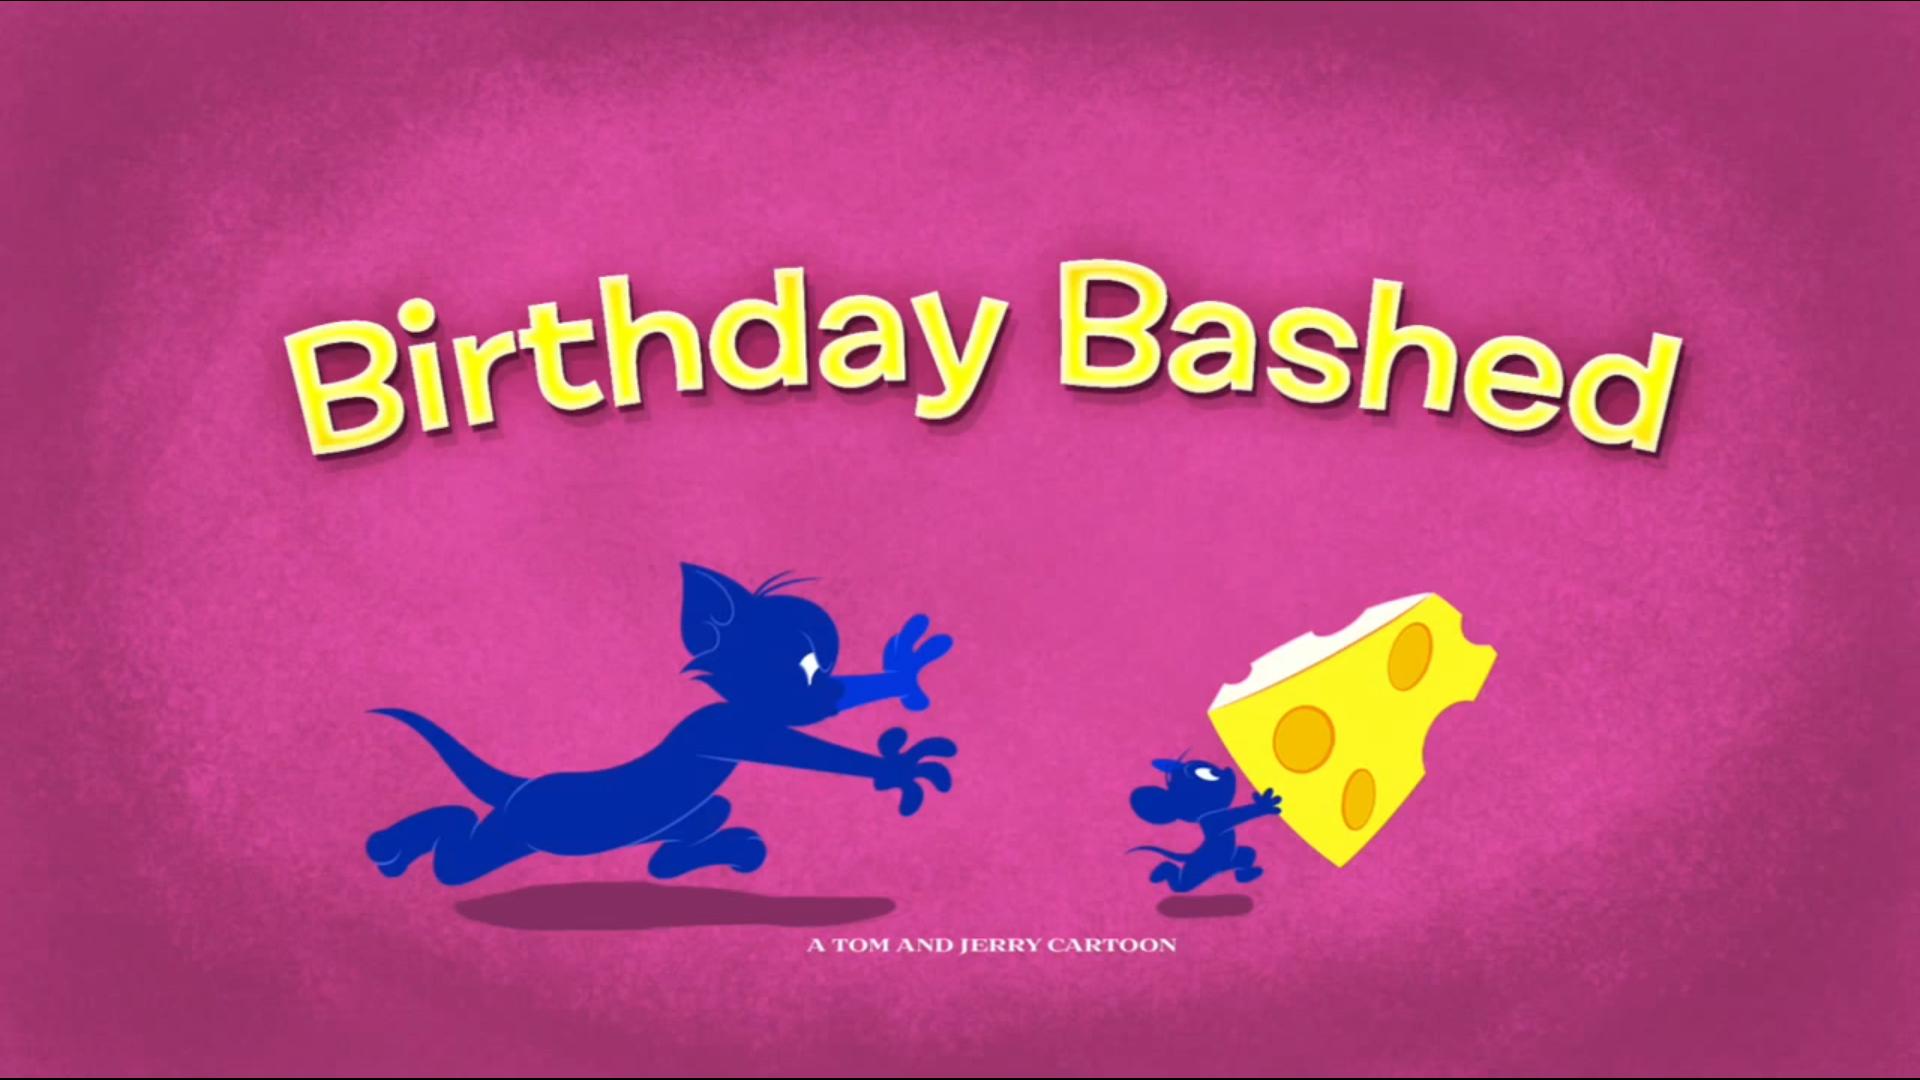 Birthday Bashed